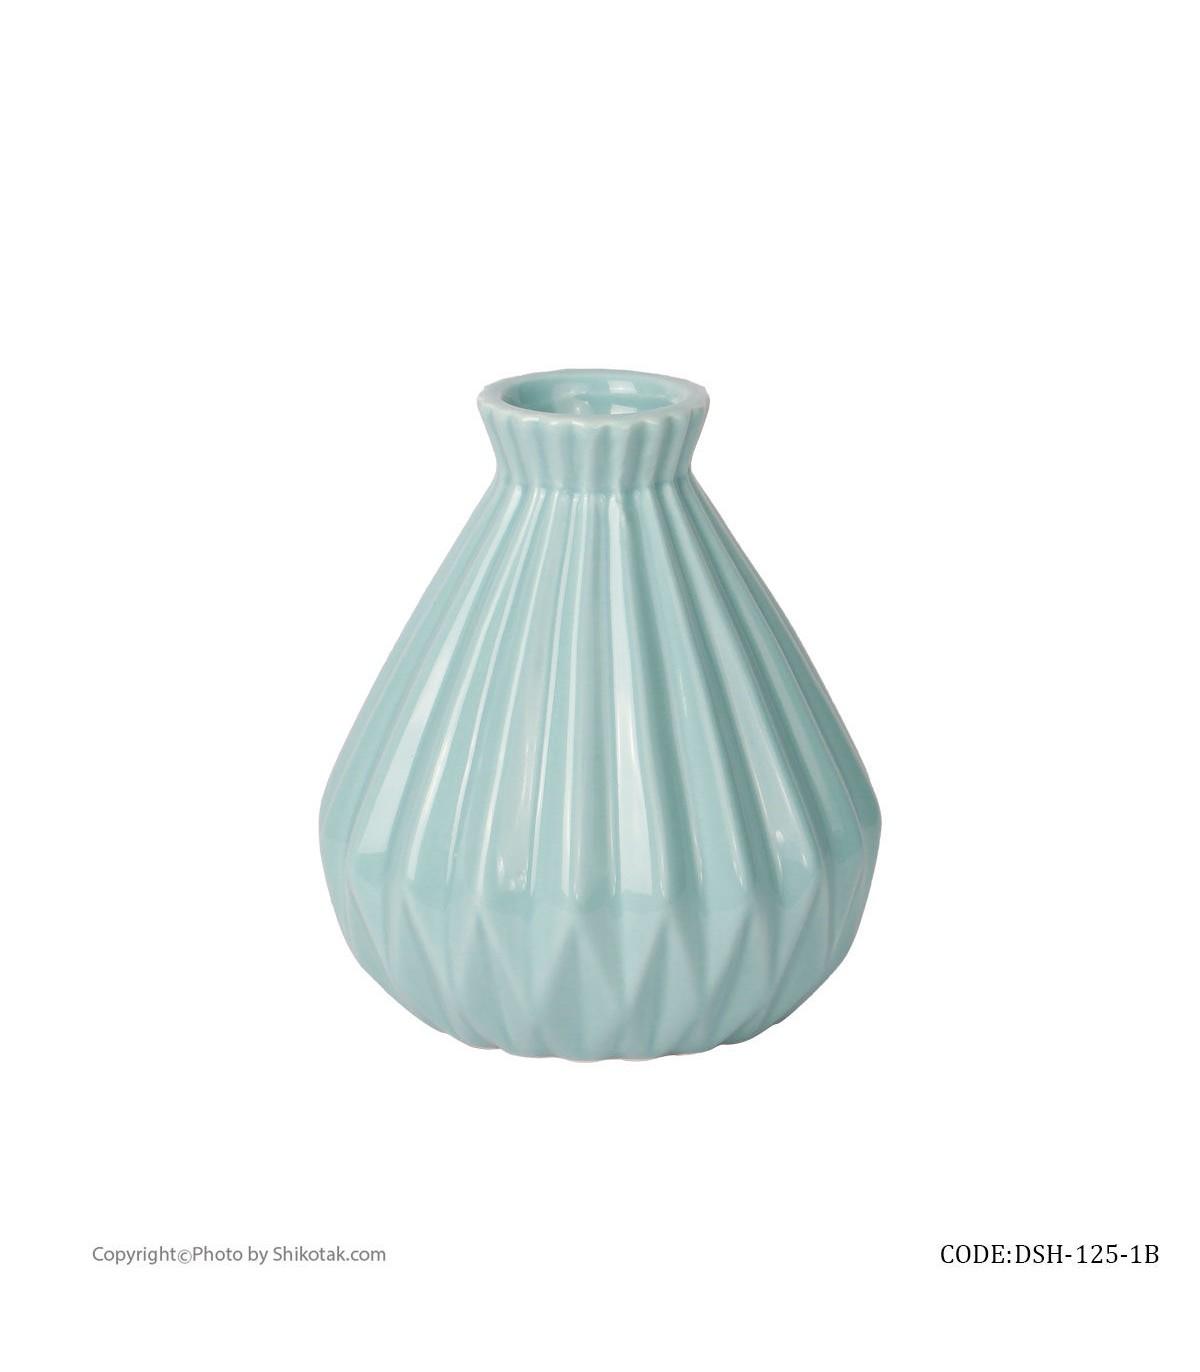 خرید گلدان آبی سرامیکی شیک و تک سری 125